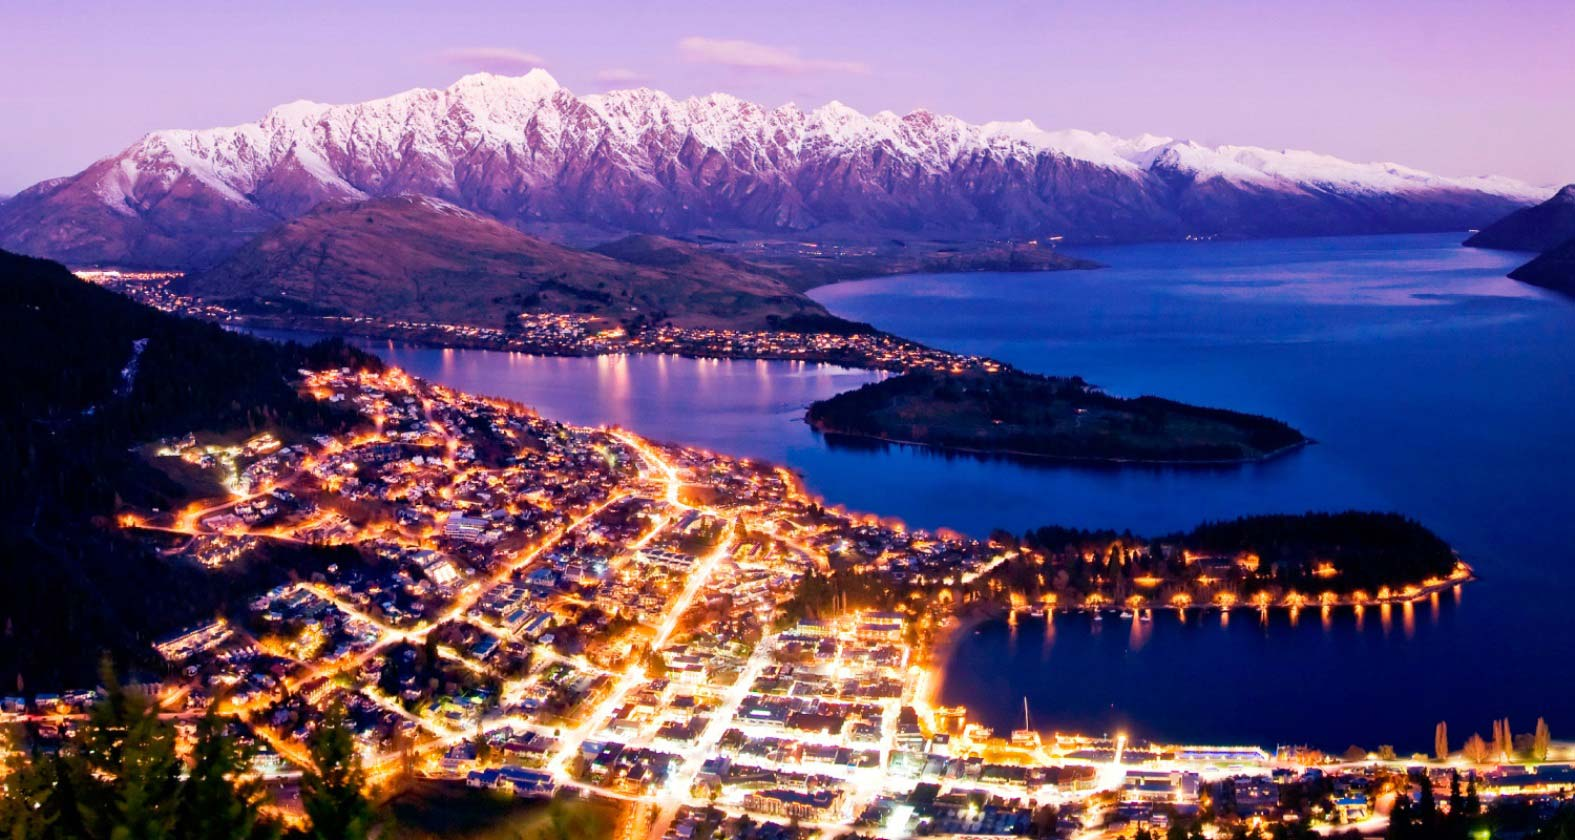 New Zealand News Wallpaper: Queenstown, New Zealand